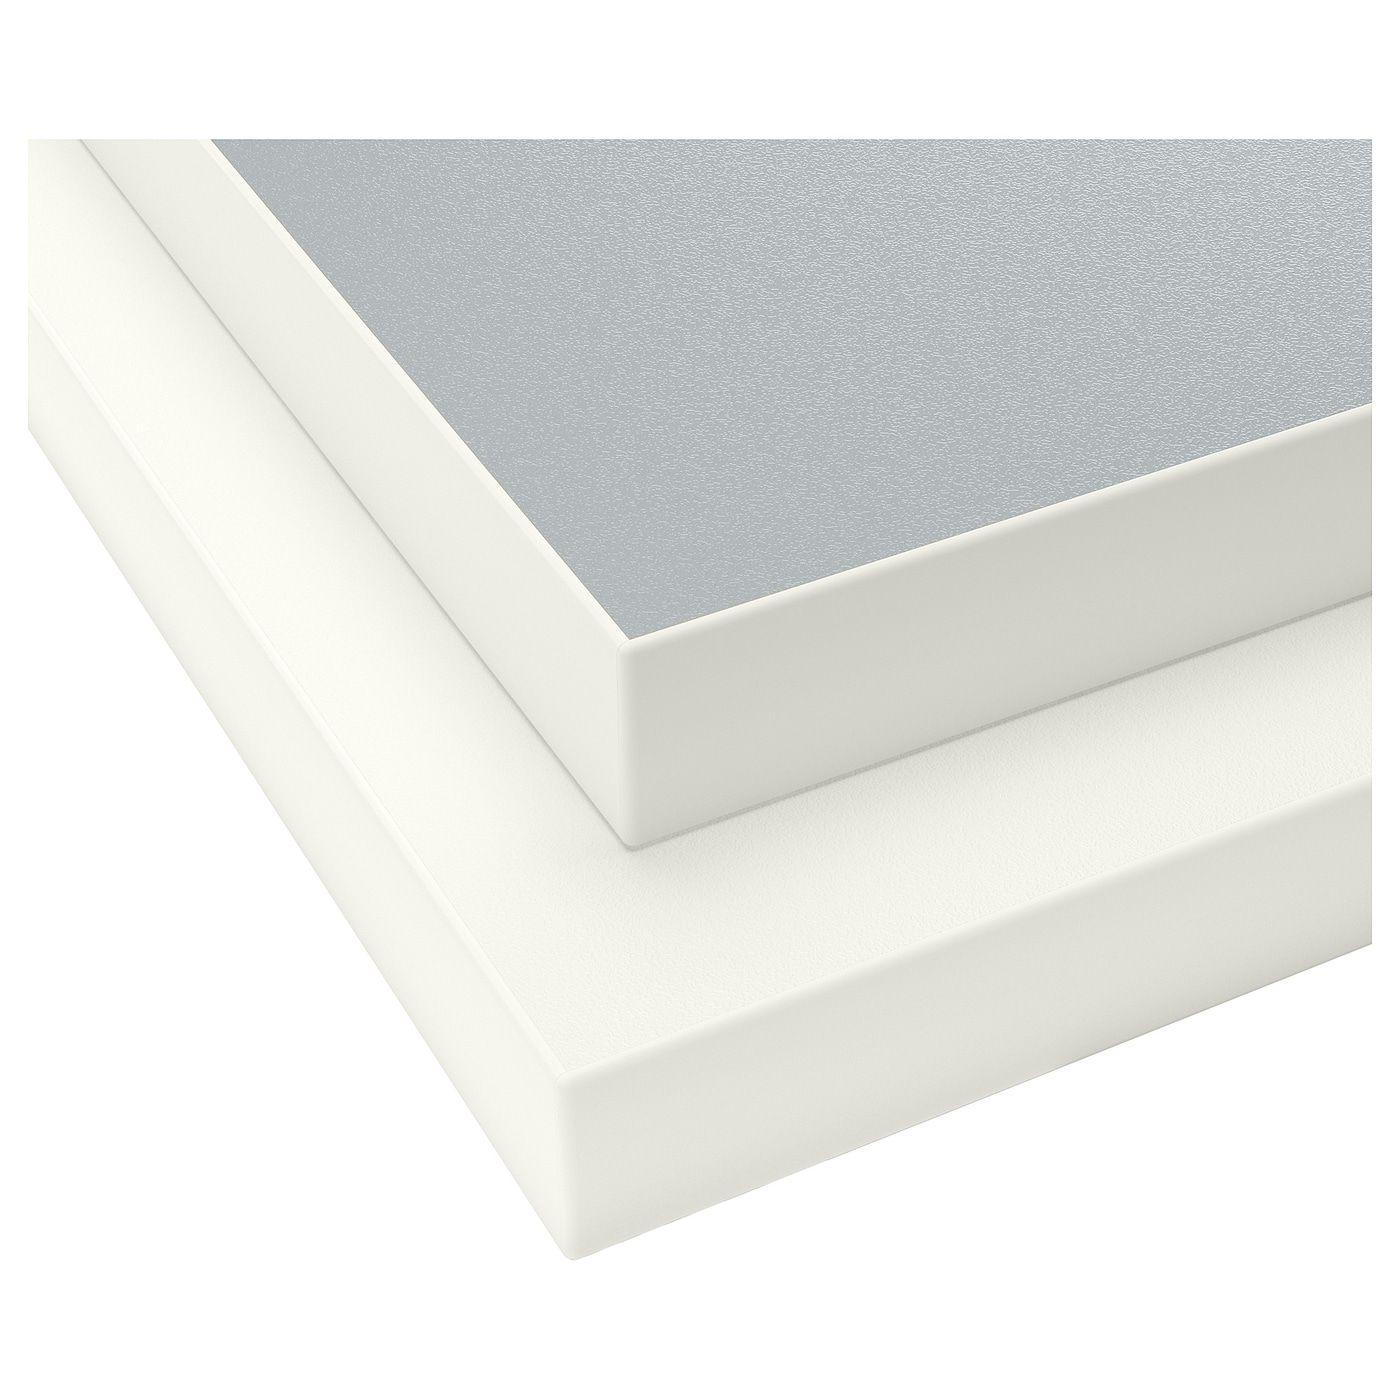 Ekbacken Countertop Double Sided With White Edge Light Gray Light Gray White Laminate White 74x1 1 8 Ikea In 2020 White Laminate Laminate Countertops Countertops